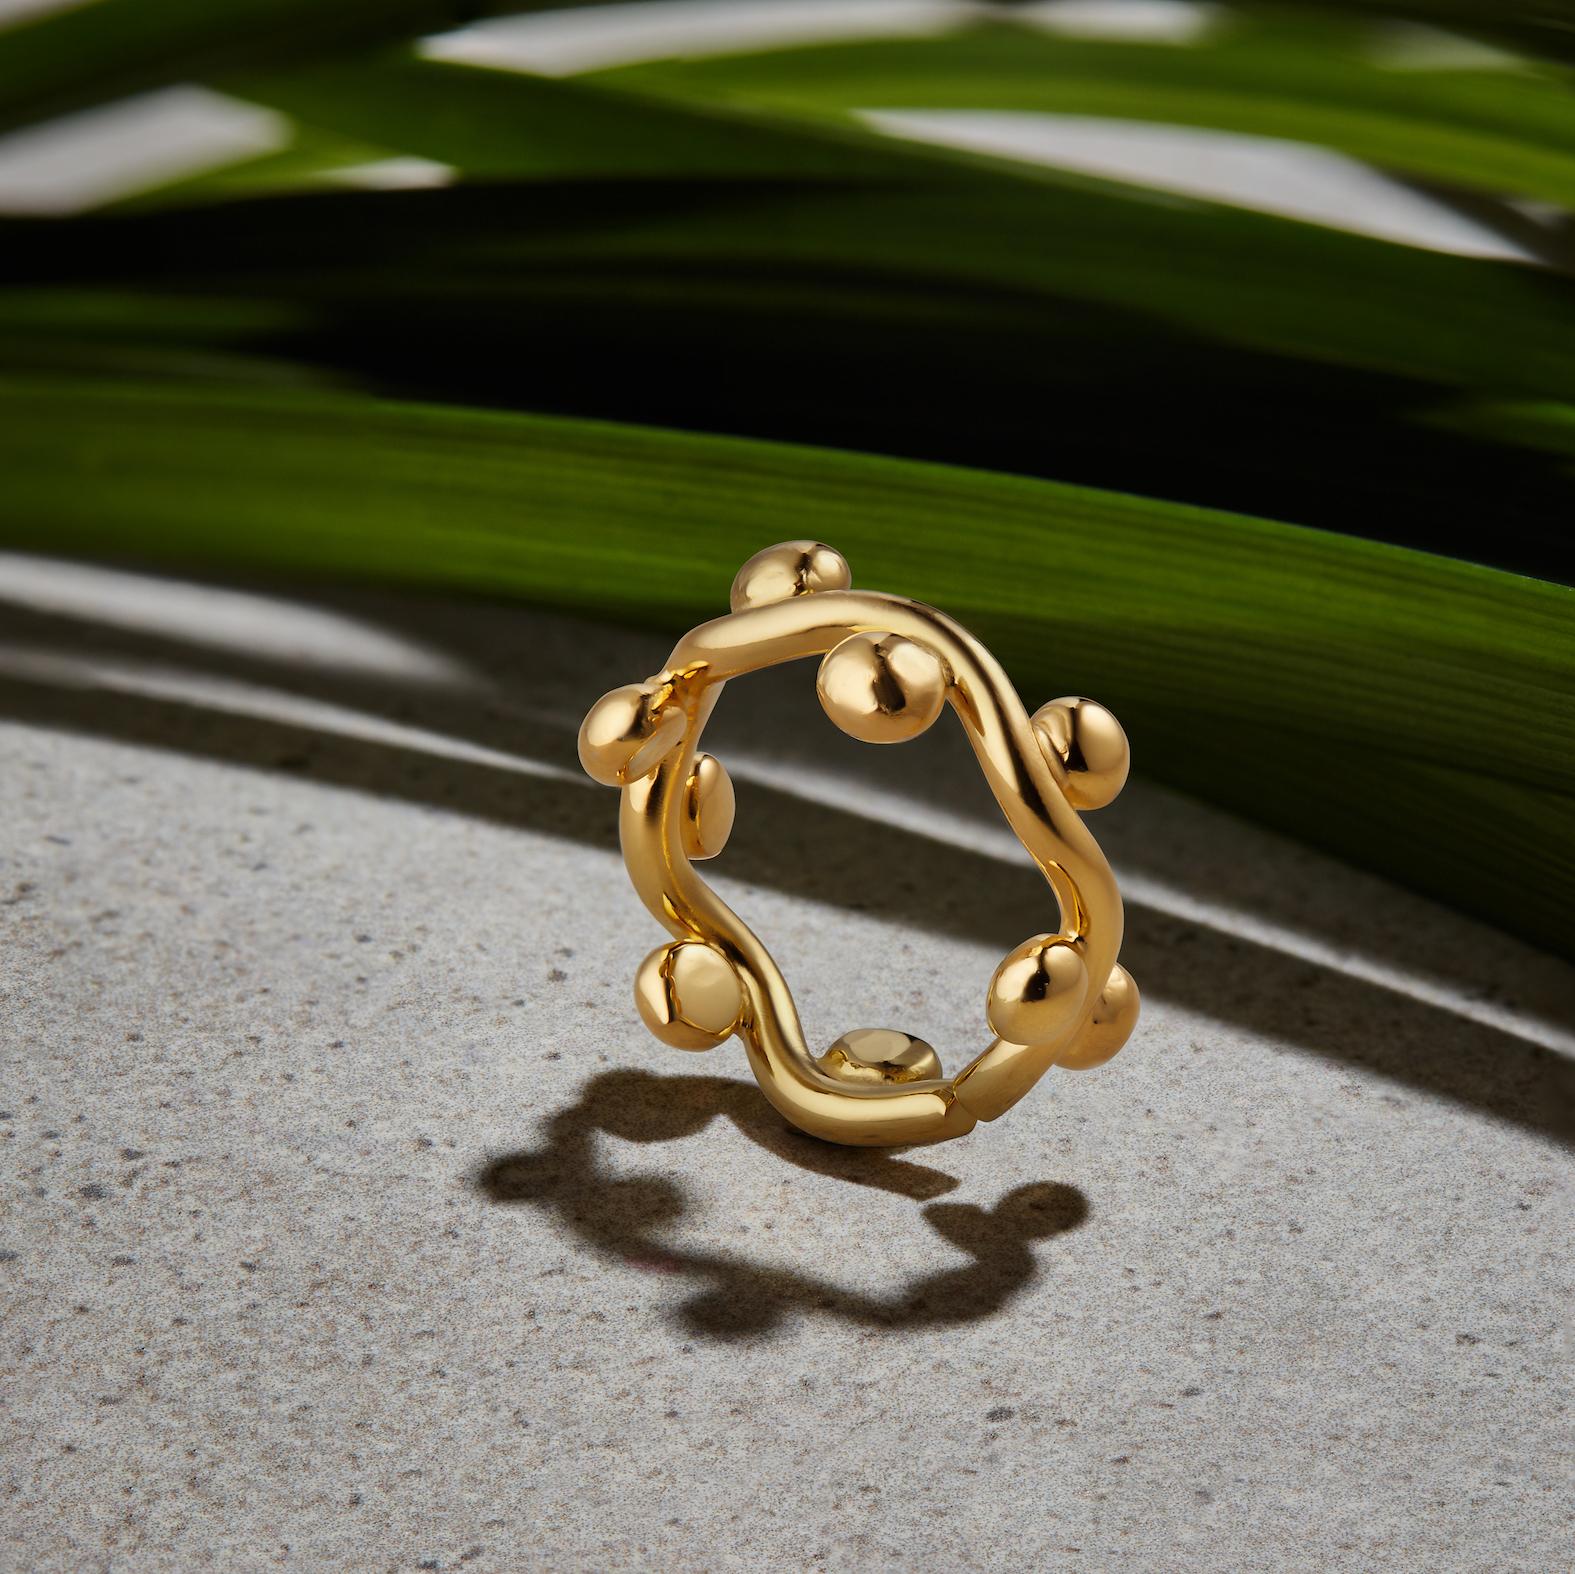 Curvez Plain Midi Ring by Jill Hopkins Jewellery on curated-crowd.com